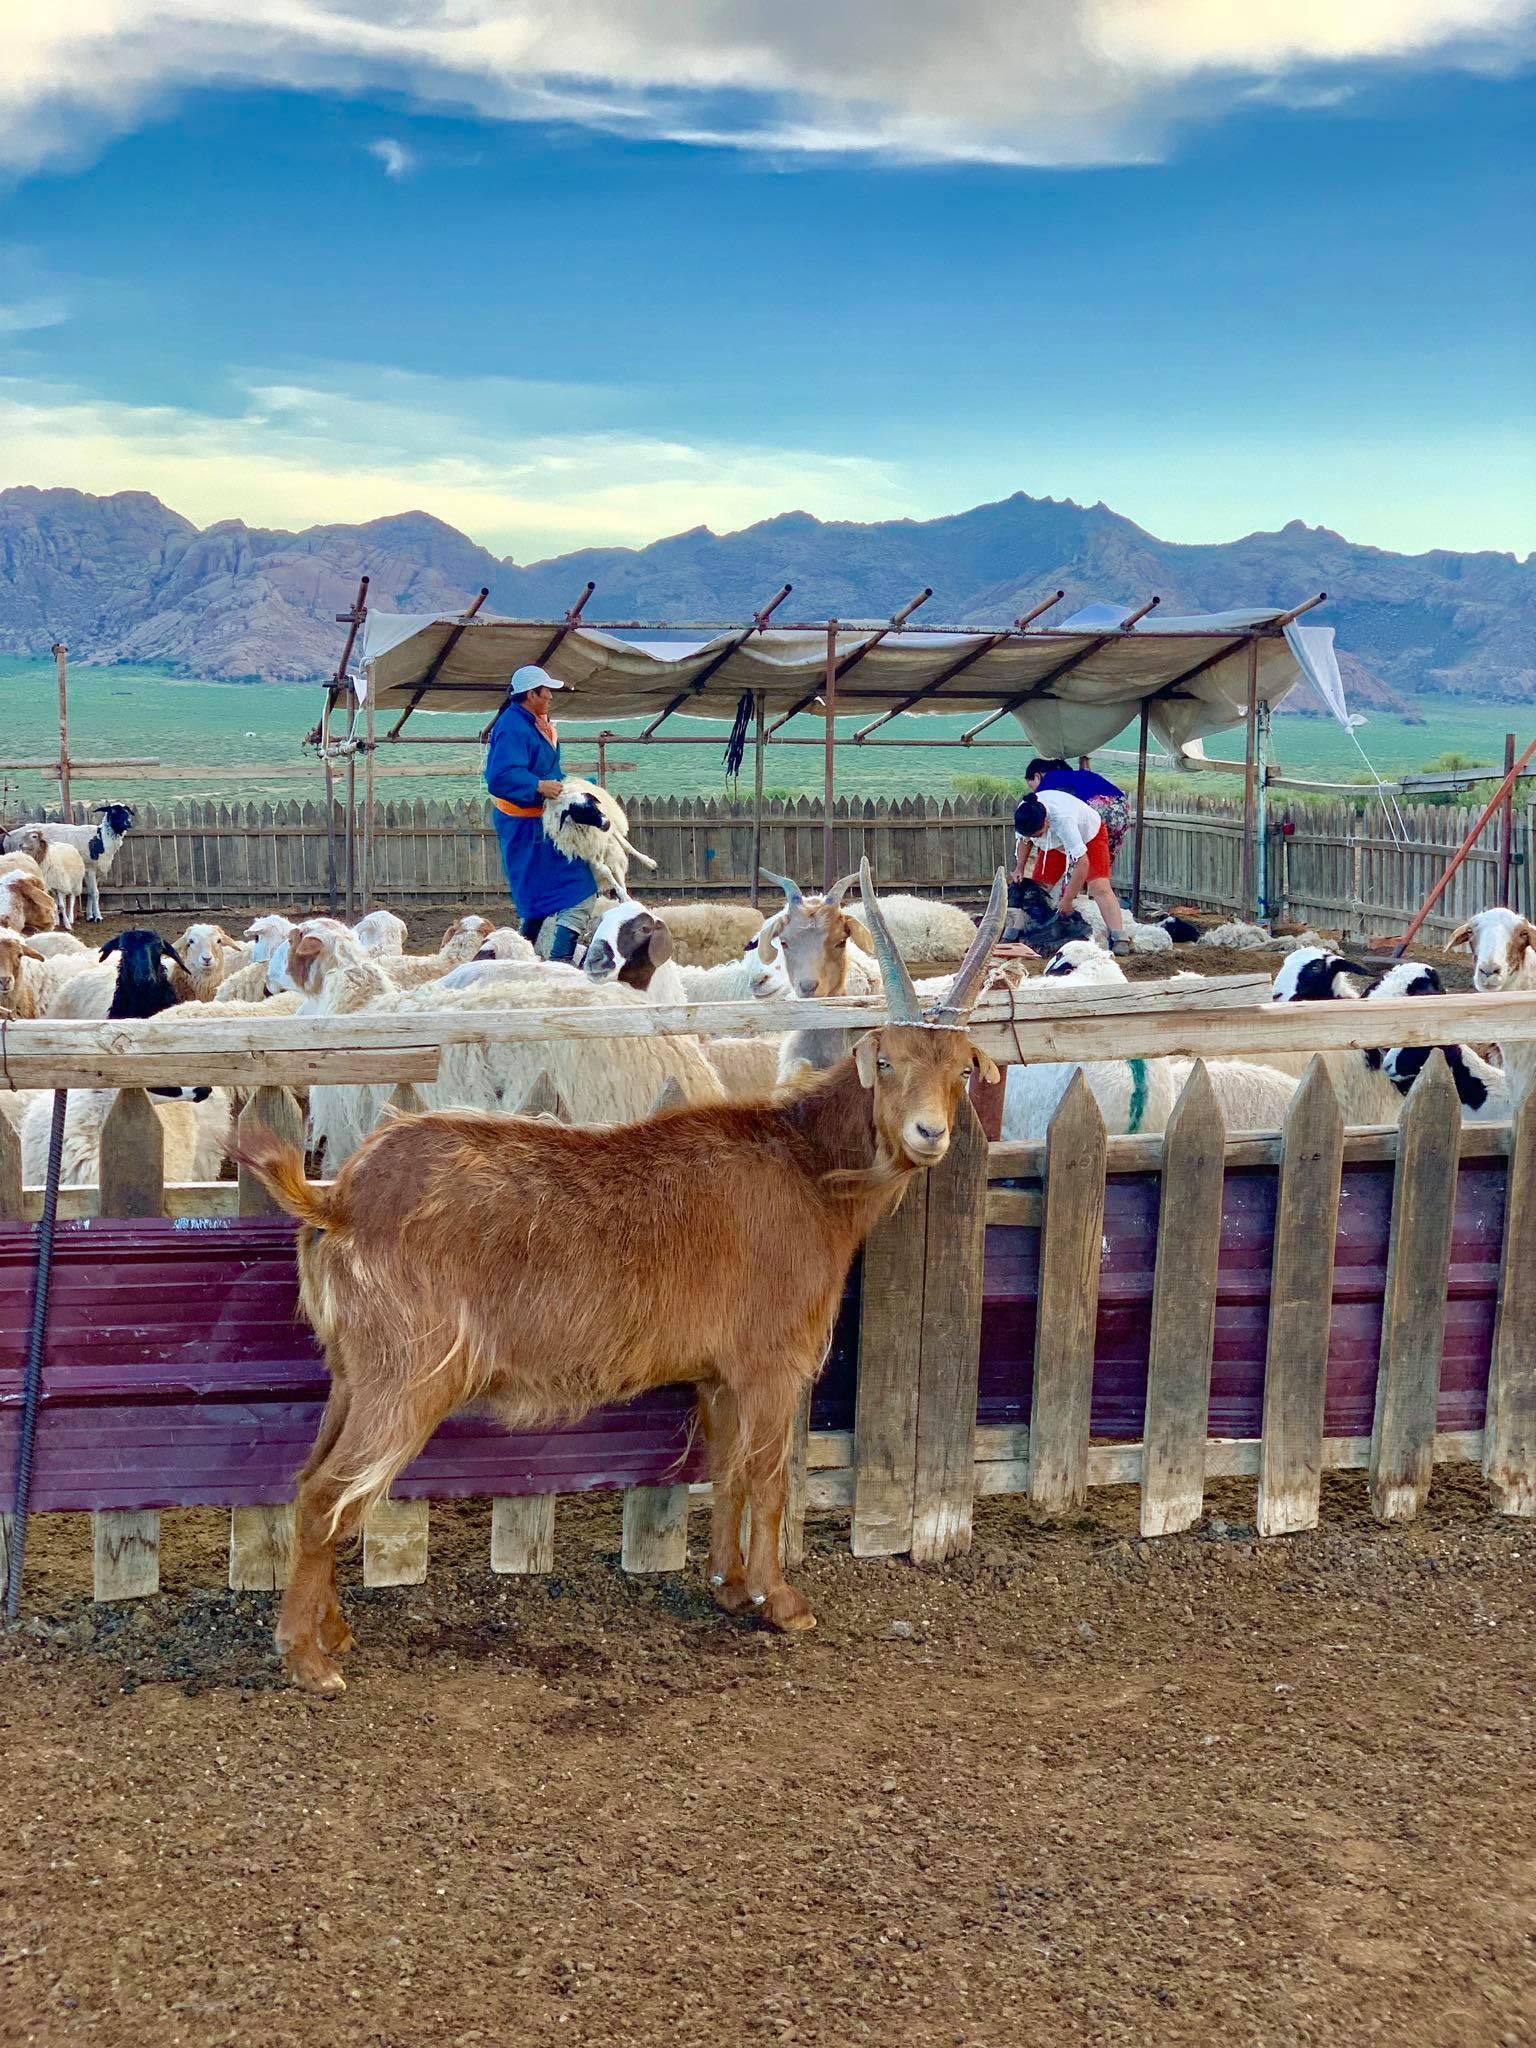 My Dream Trip To Mongolia4